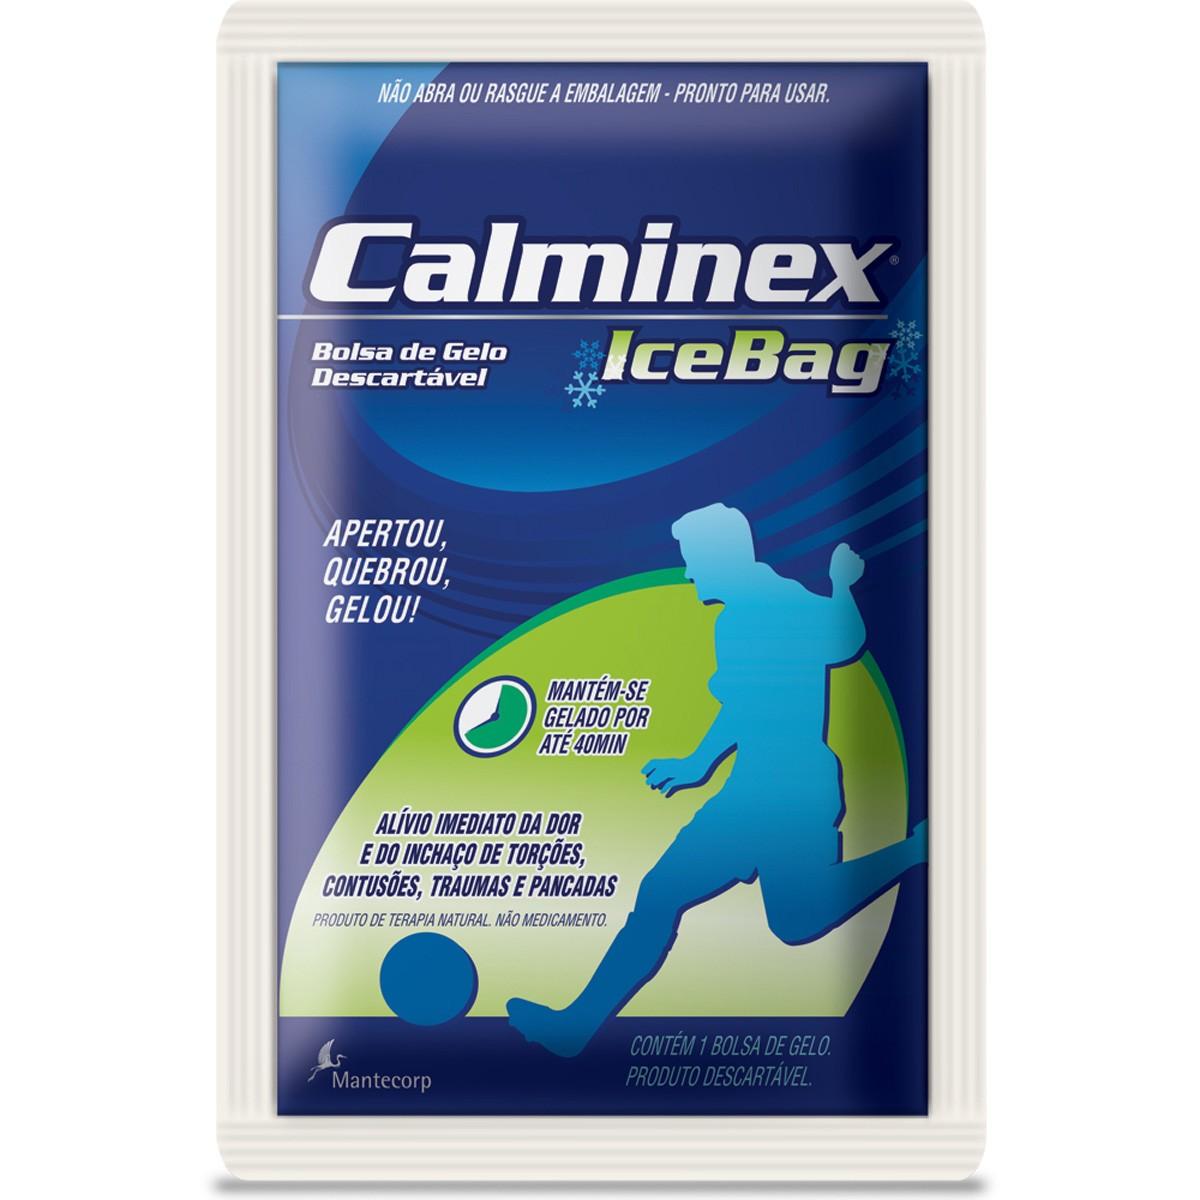 Calminex Ice Bag Analgesico Bolsa Termica De 284g